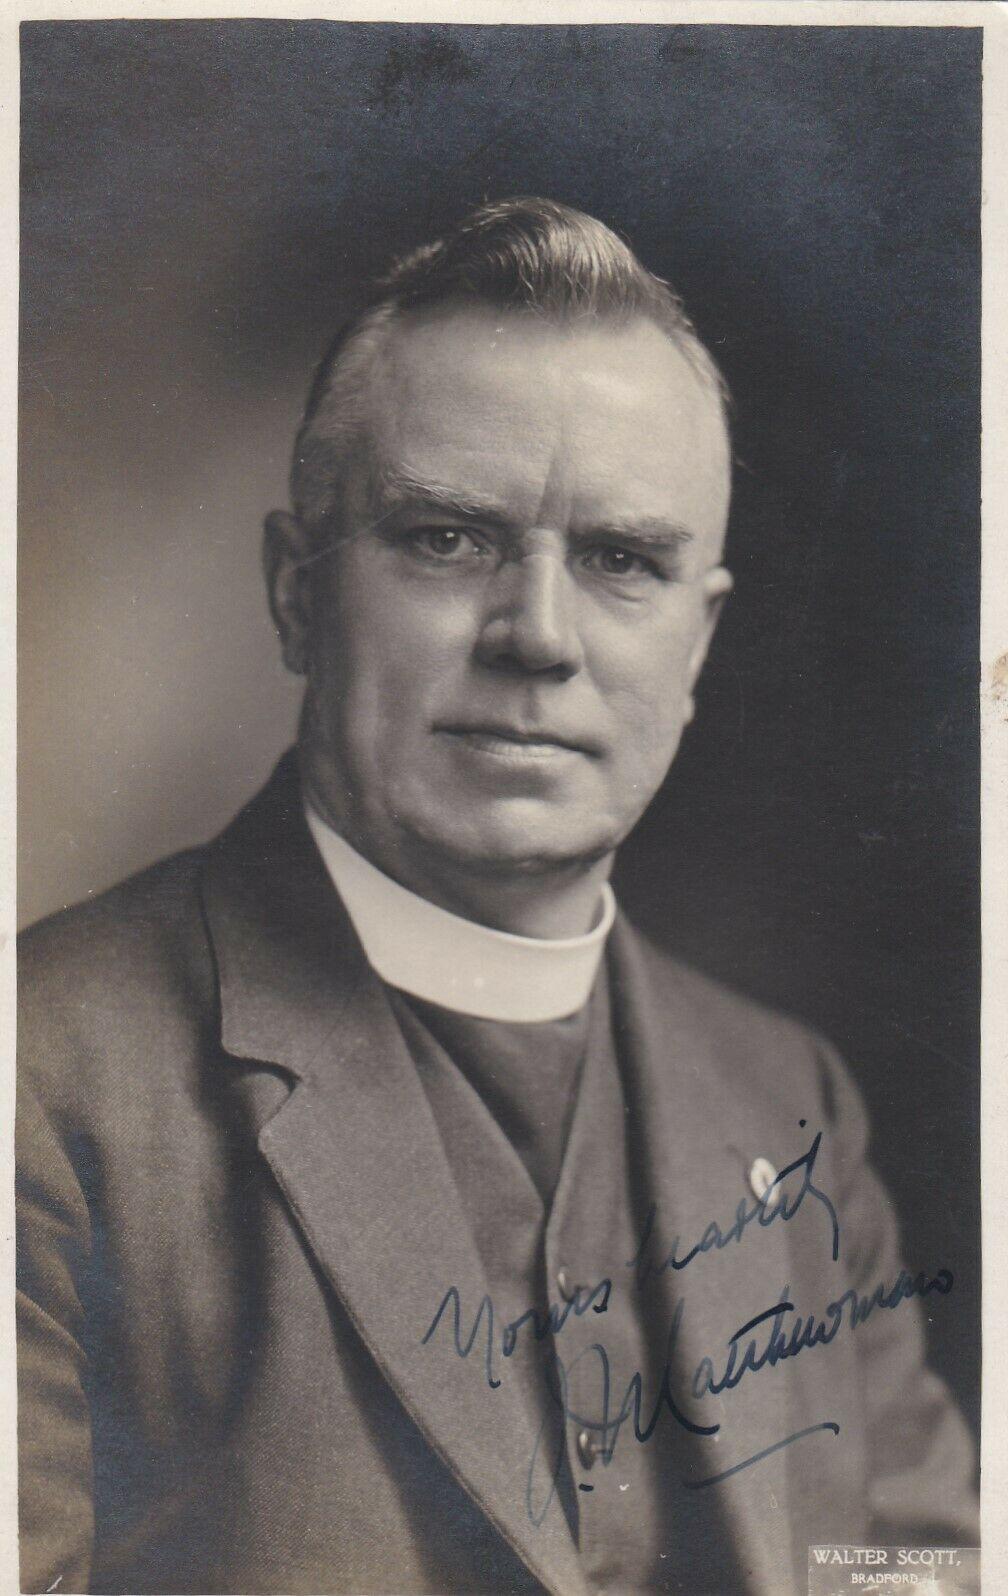 Rev-John-Matthewman-Weslyan-Church-Shotley-Bridge-and-Consett-Circuit-1927